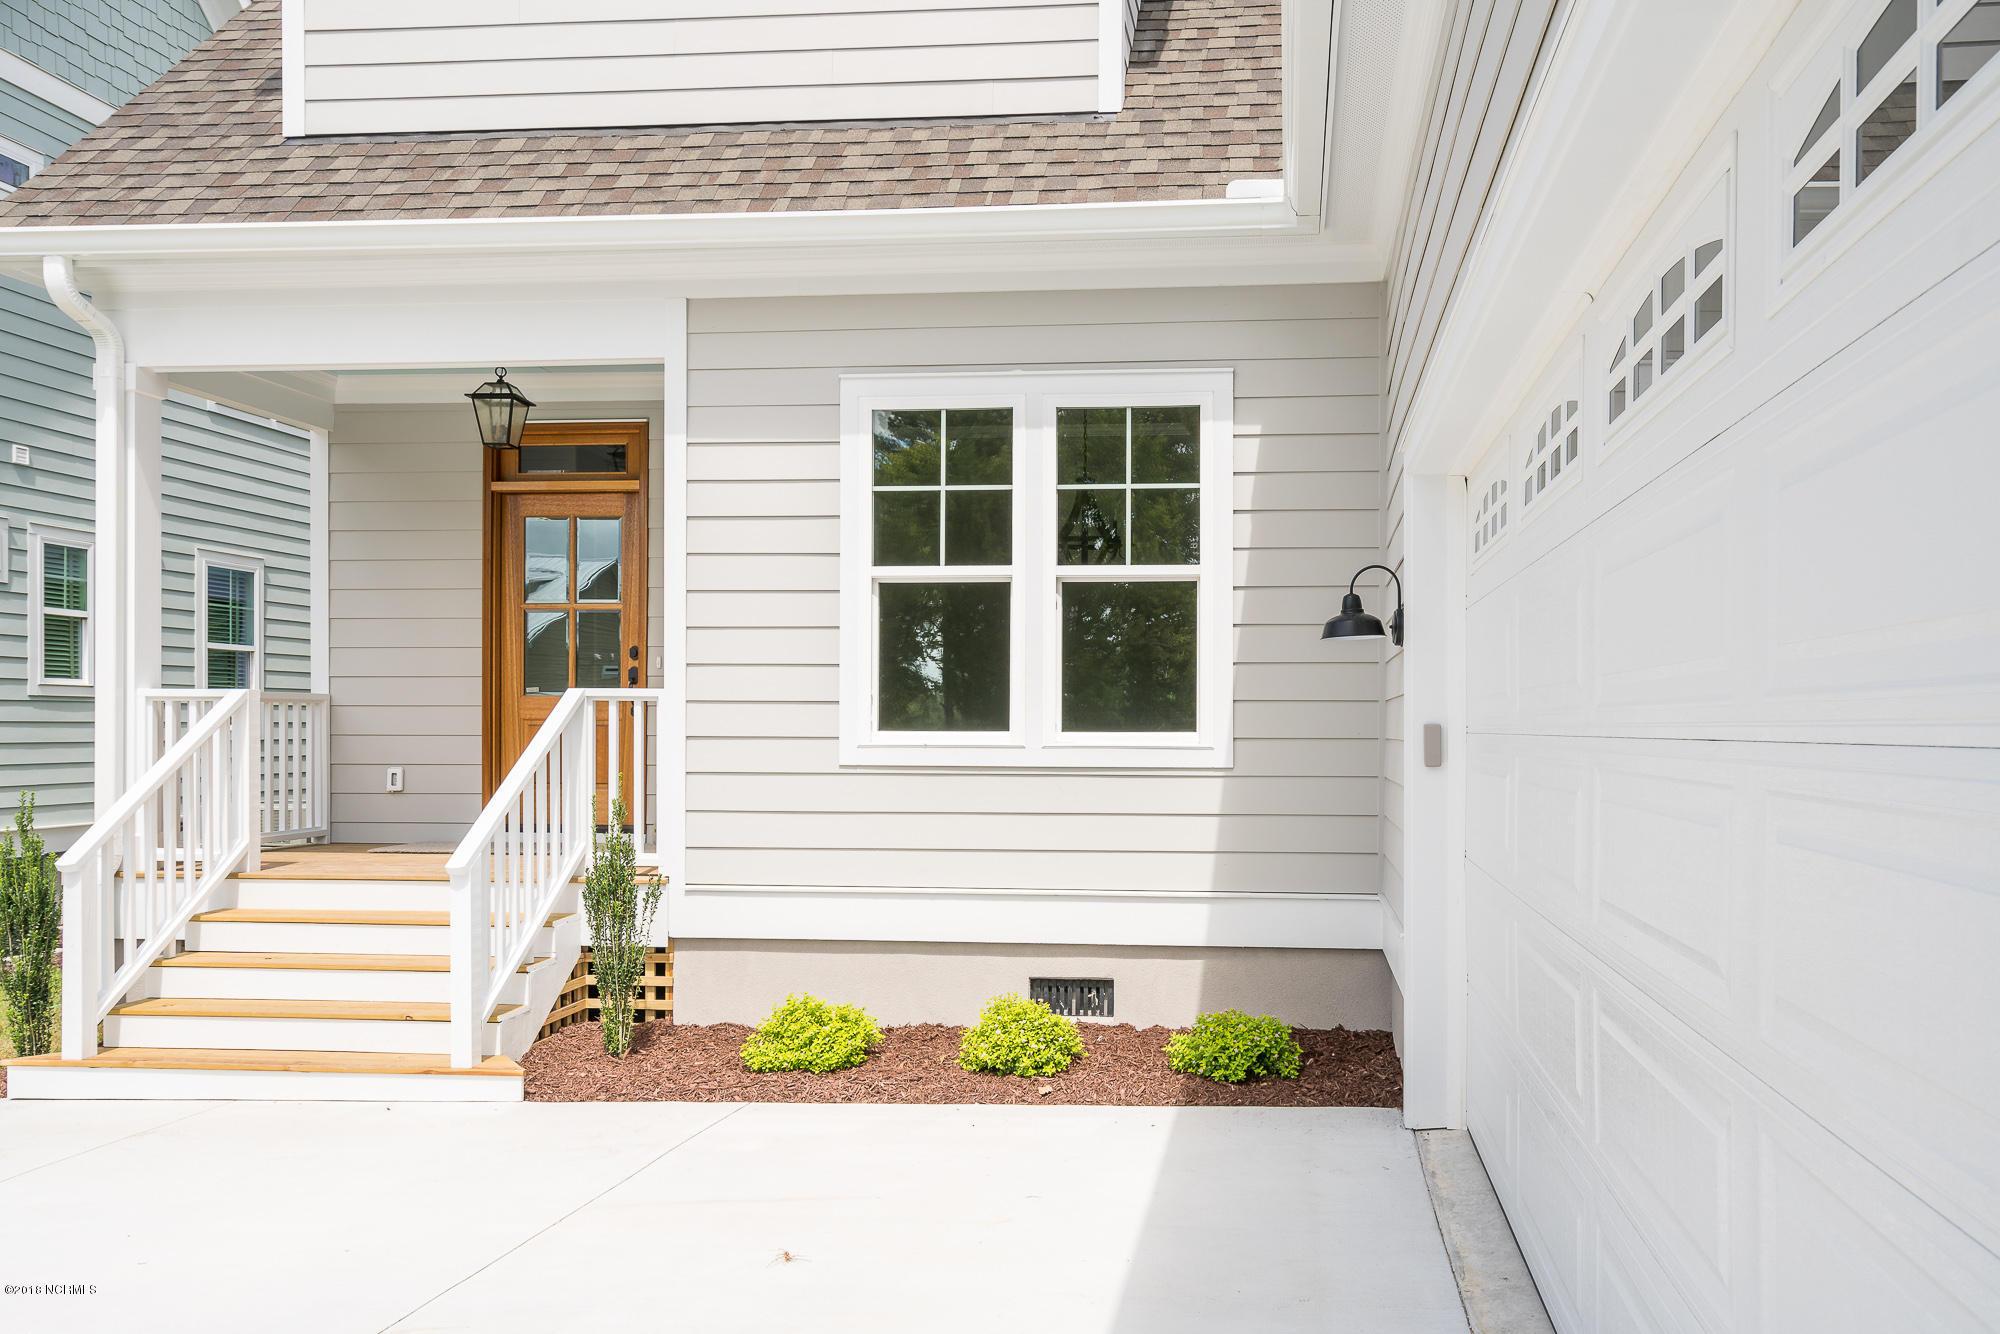 206 Shoreview Drive,New Bern,North Carolina,3 Bedrooms Bedrooms,6 Rooms Rooms,2 BathroomsBathrooms,Single family residence,Shoreview,100099320